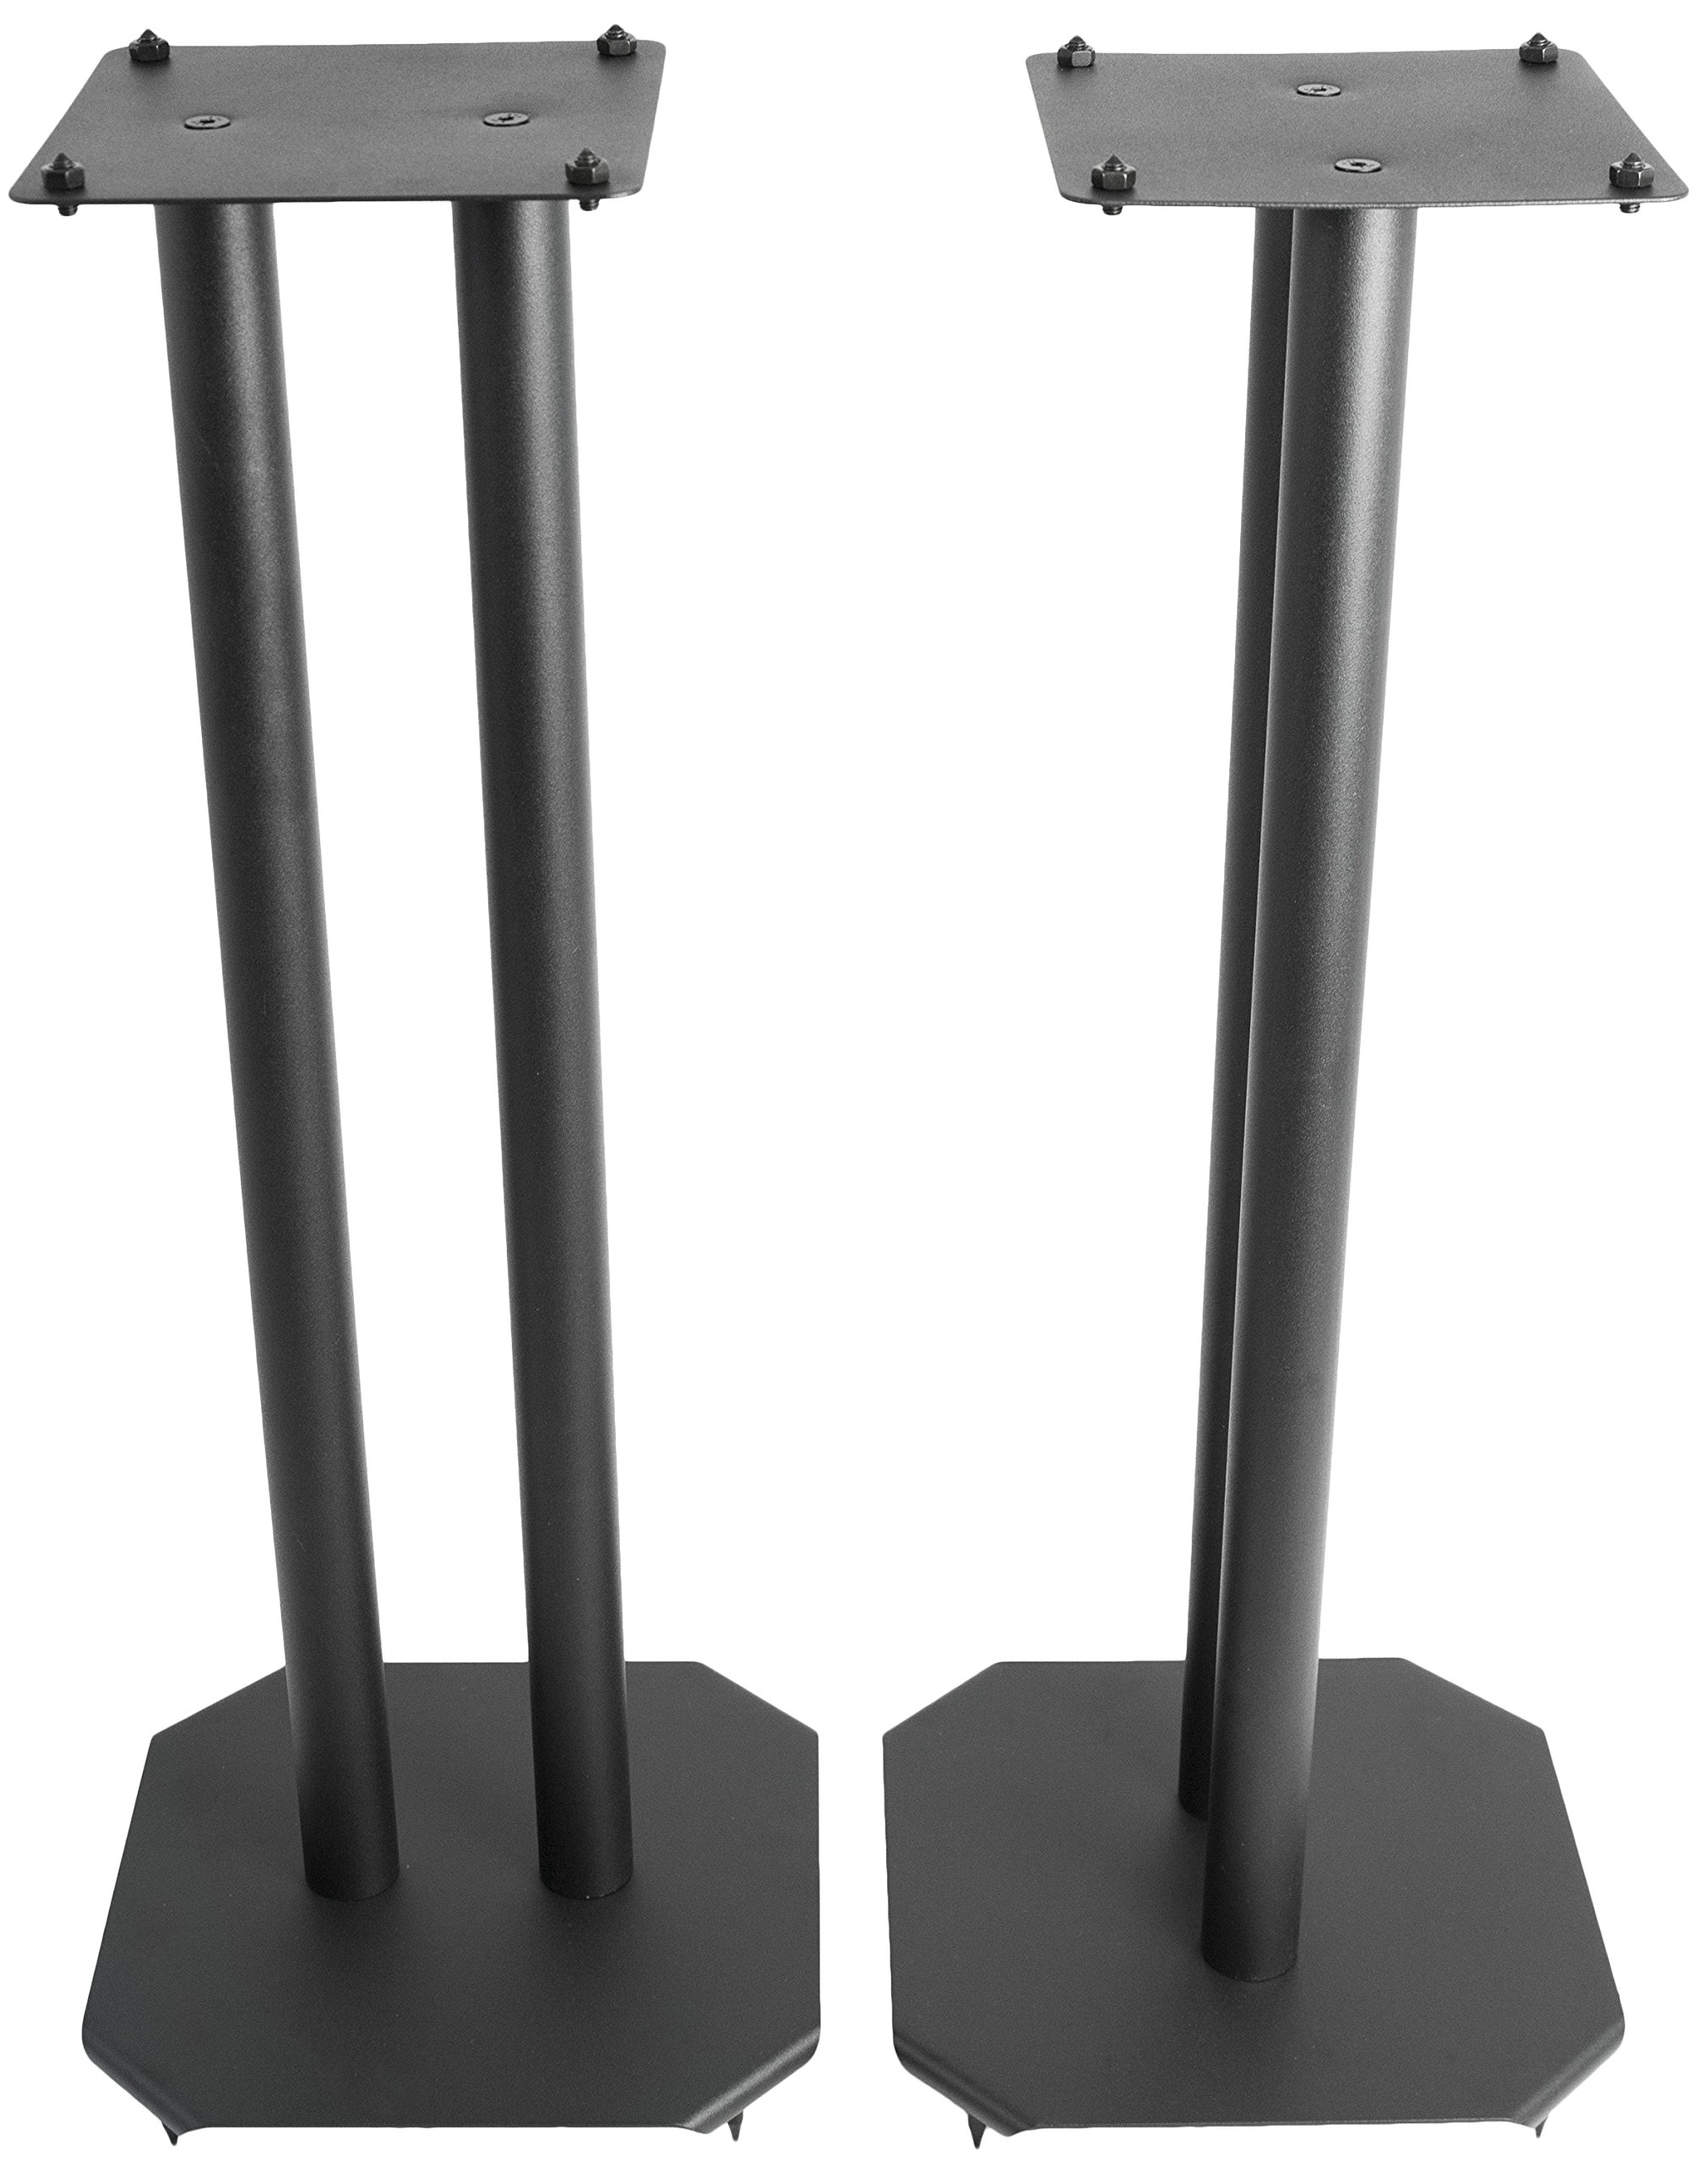 VIVO Premium Universal Floor Speaker Stands for Surround Sound & Book Shelf Speakers (STAND-SP03B)